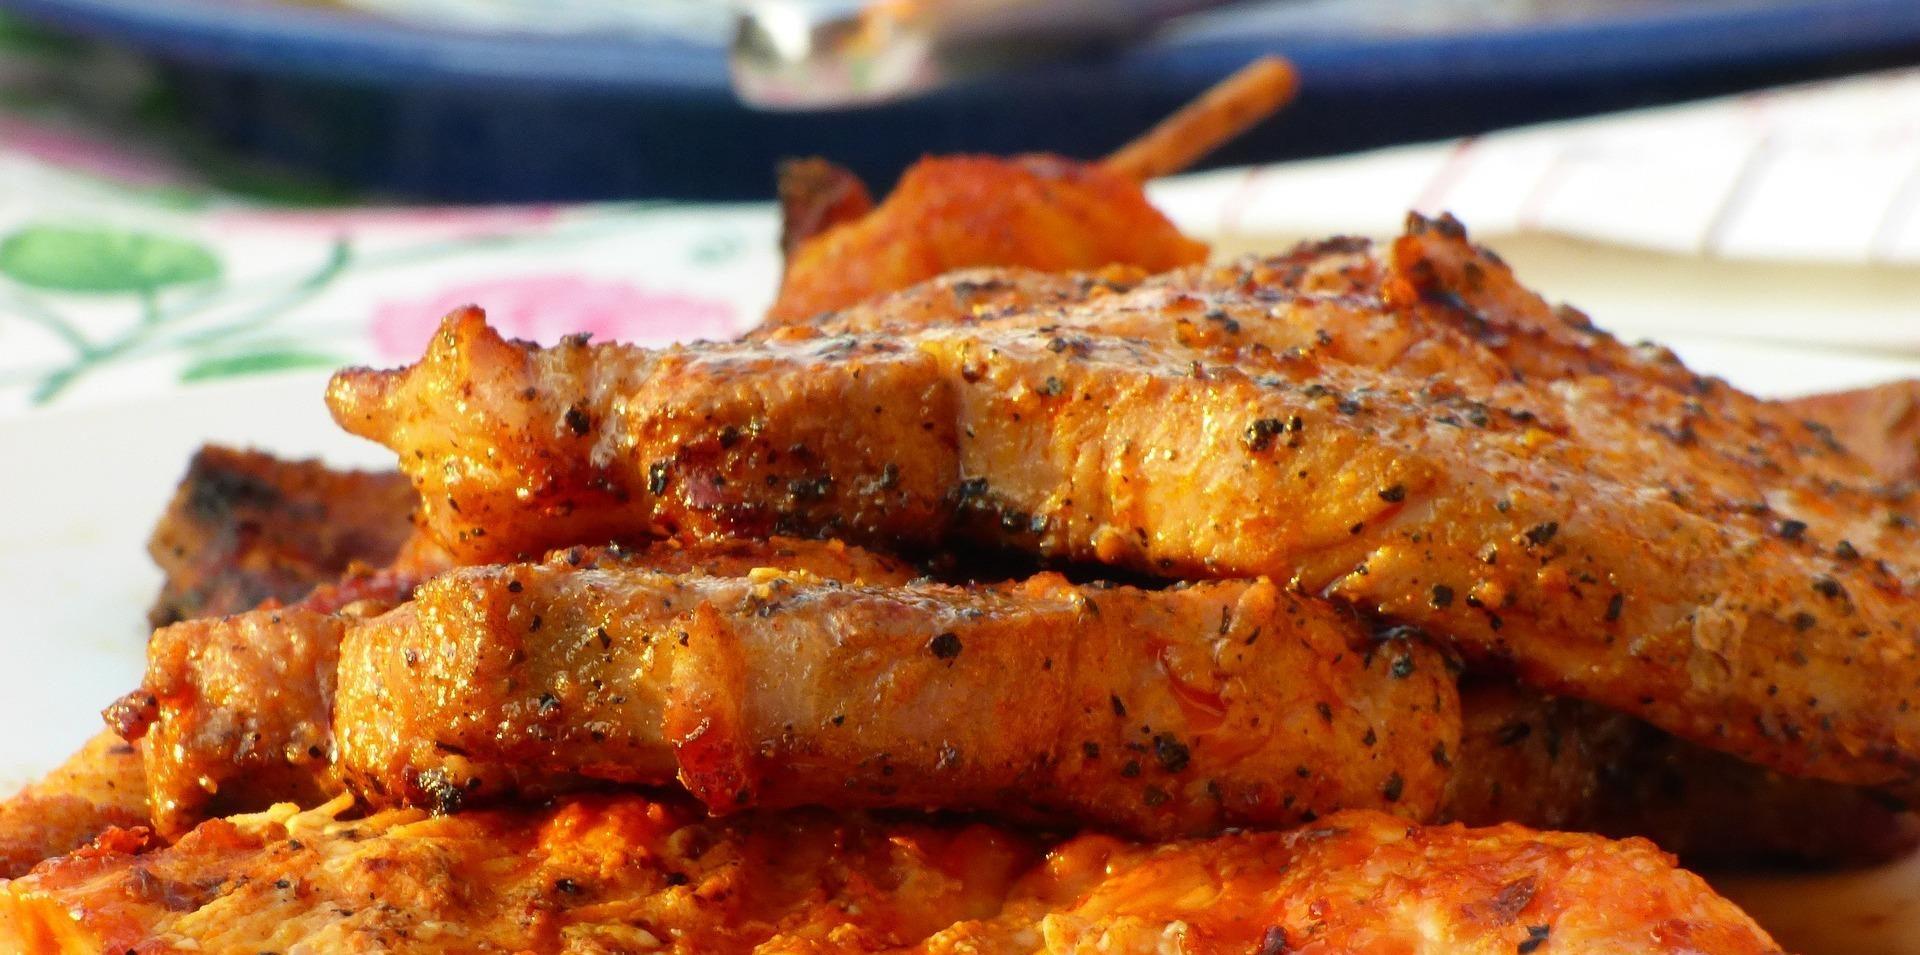 стейки из свинины на гриле на тарелке